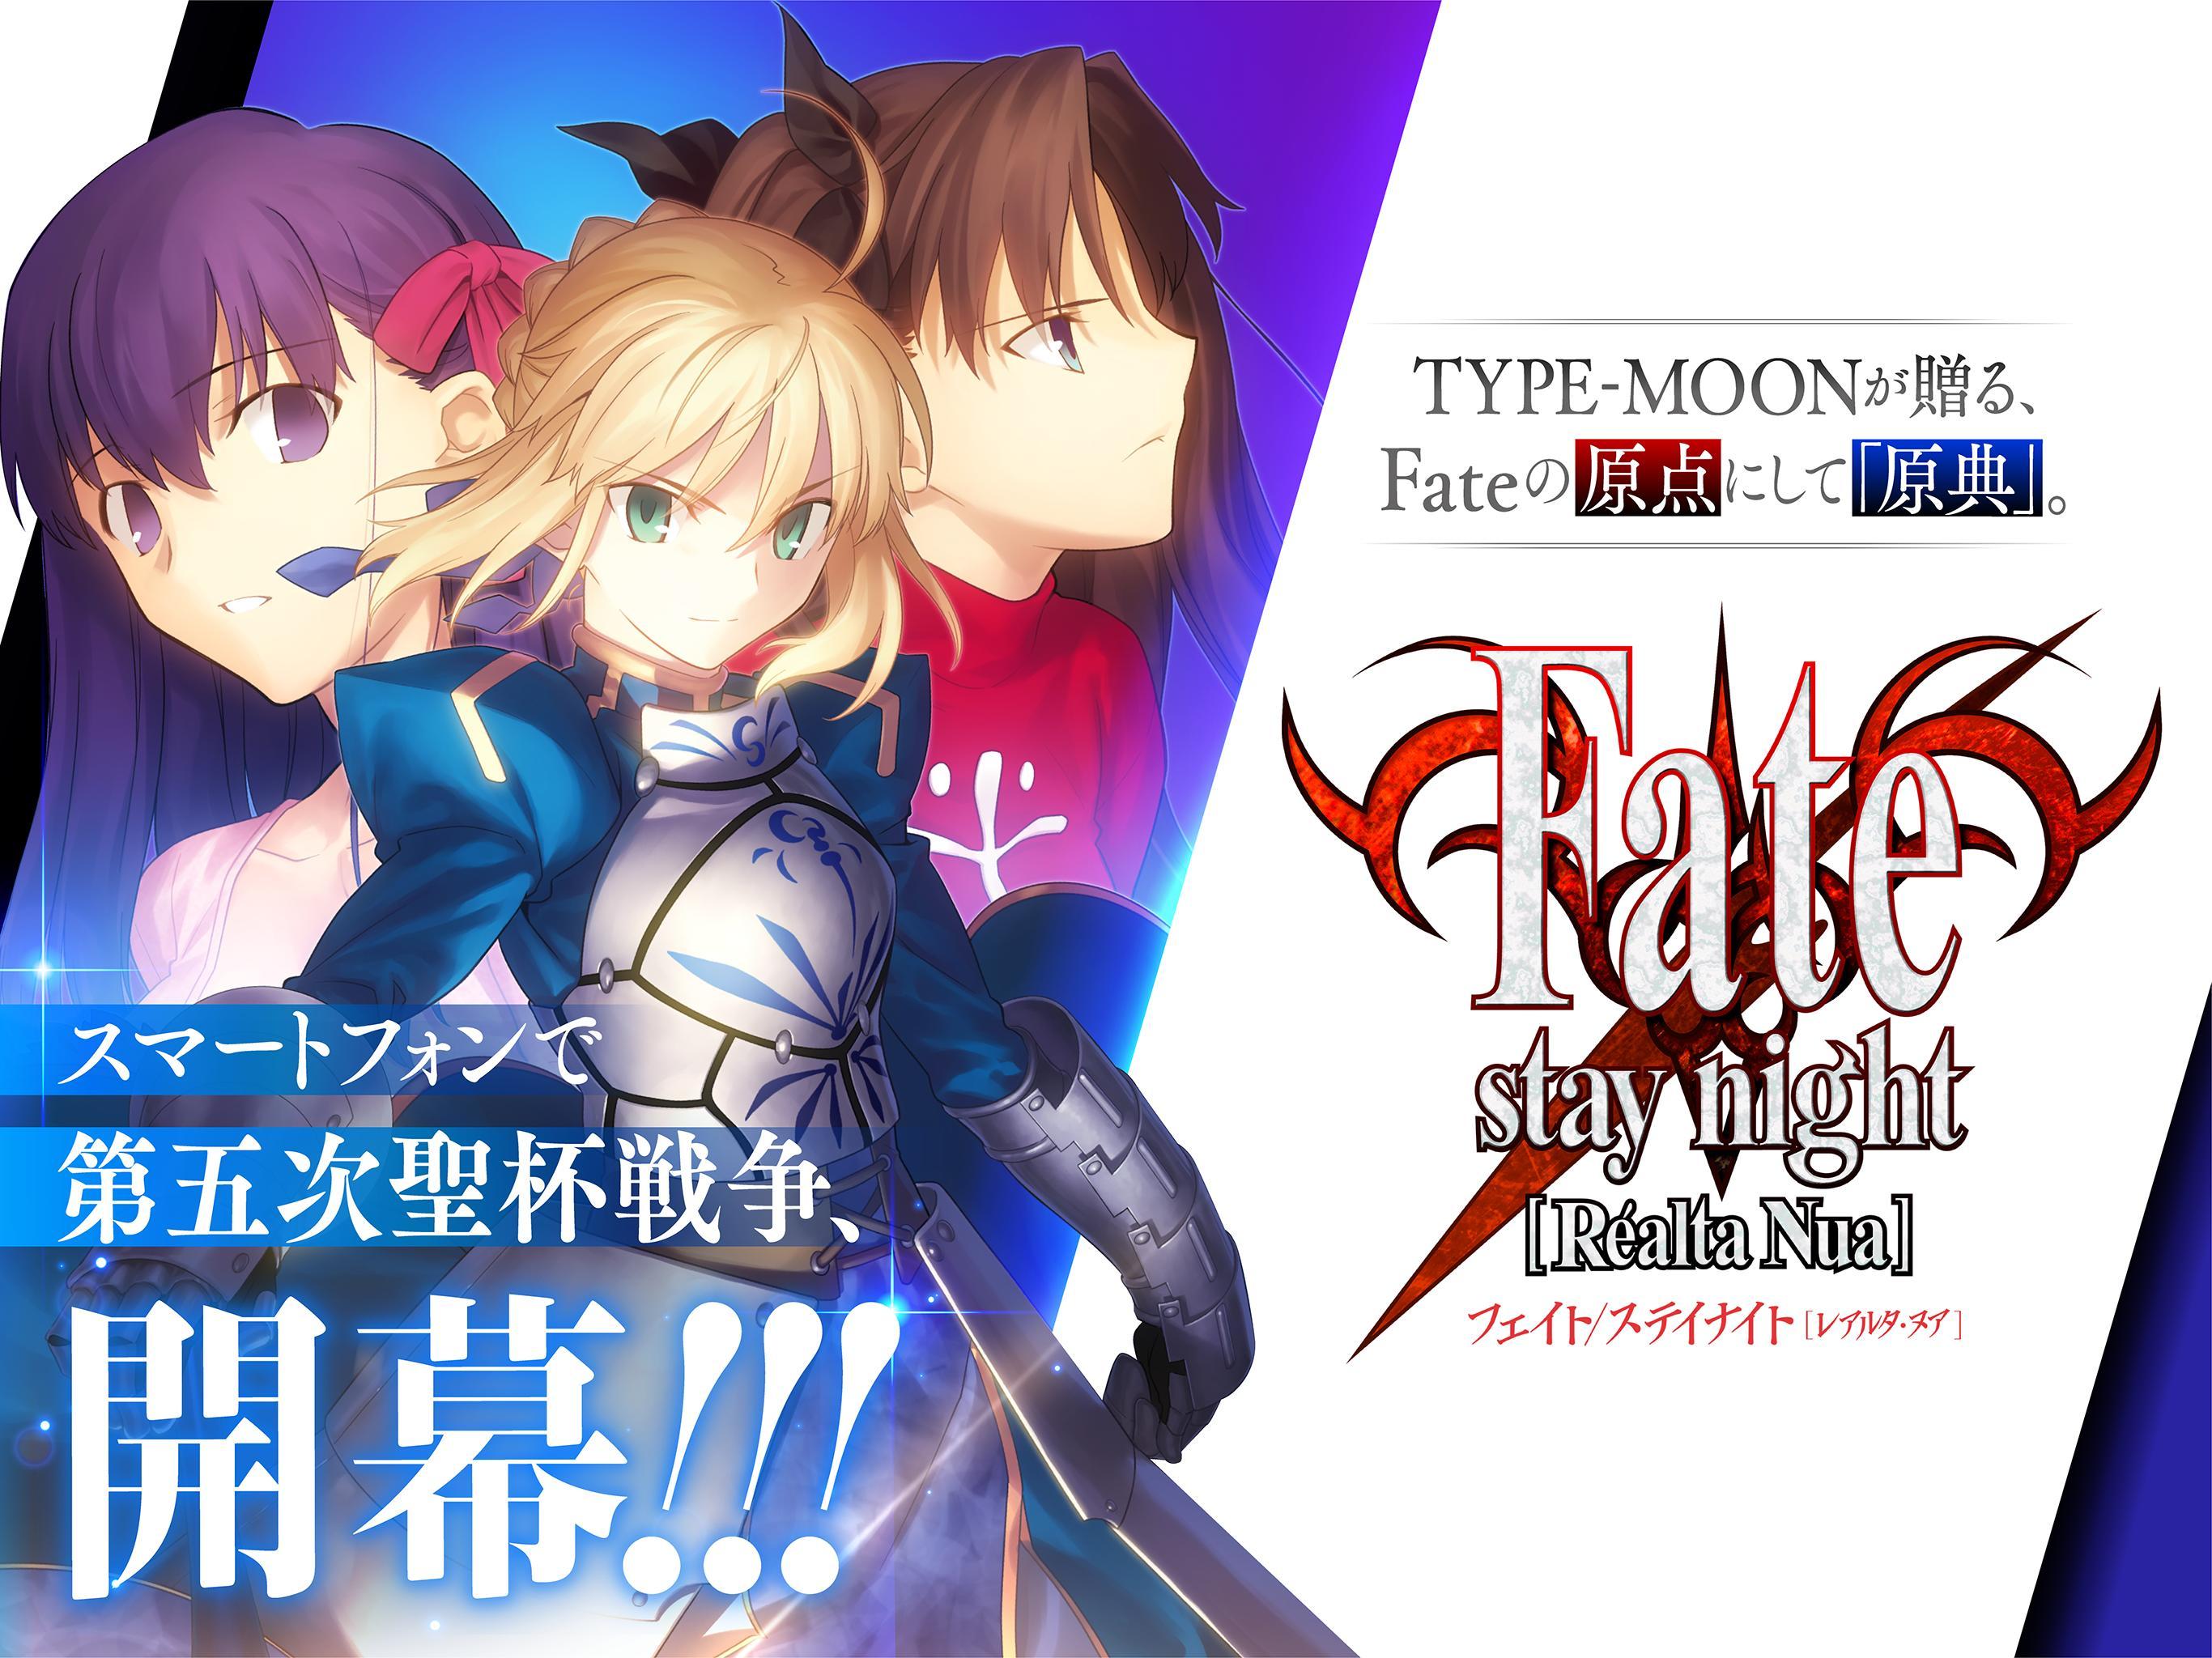 Fate/stay night [Realta Nua] 2.1.8 Screenshot 6